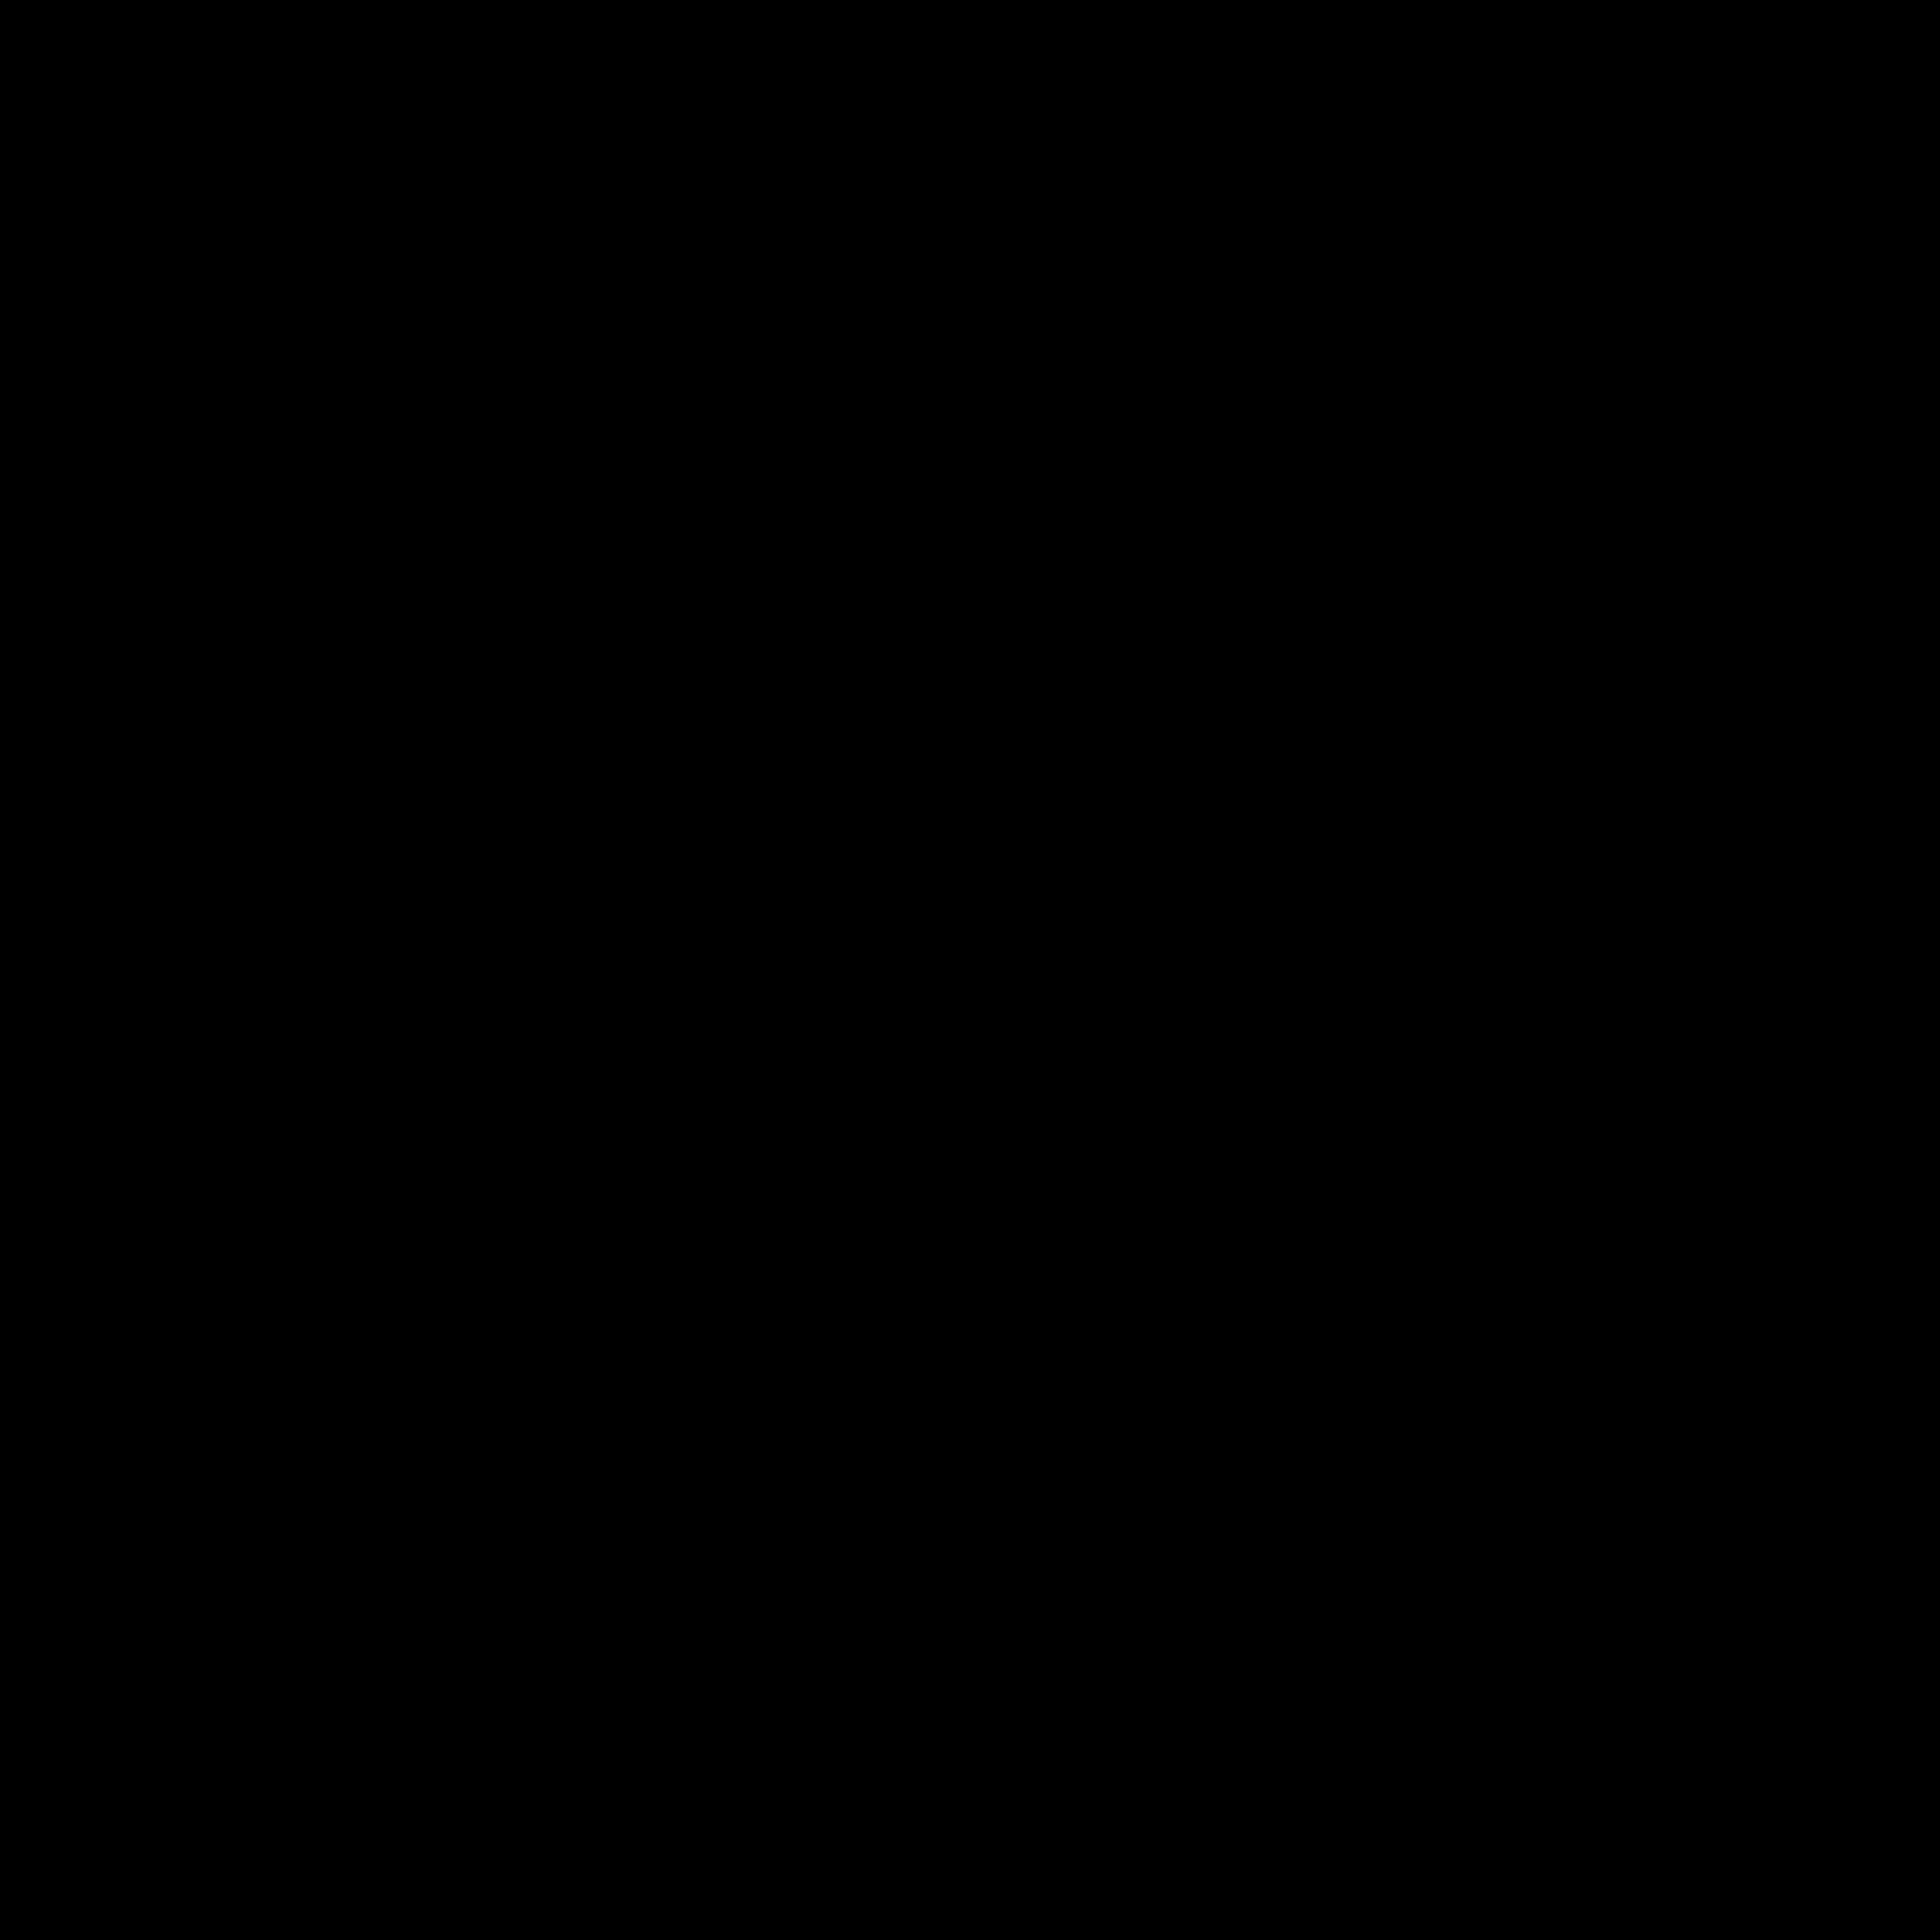 BIG IMAGE (PNG) - Peace Symbol PNG